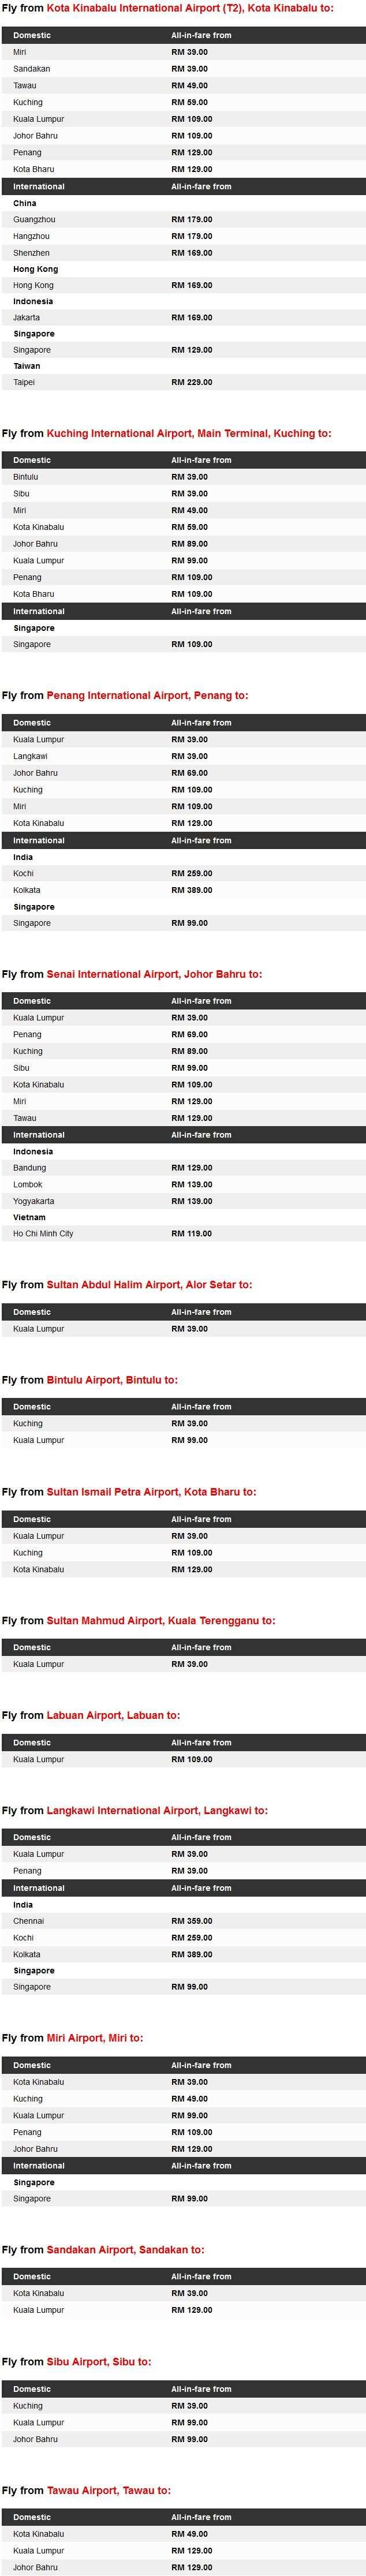 AirAsia Same Low Fares Details